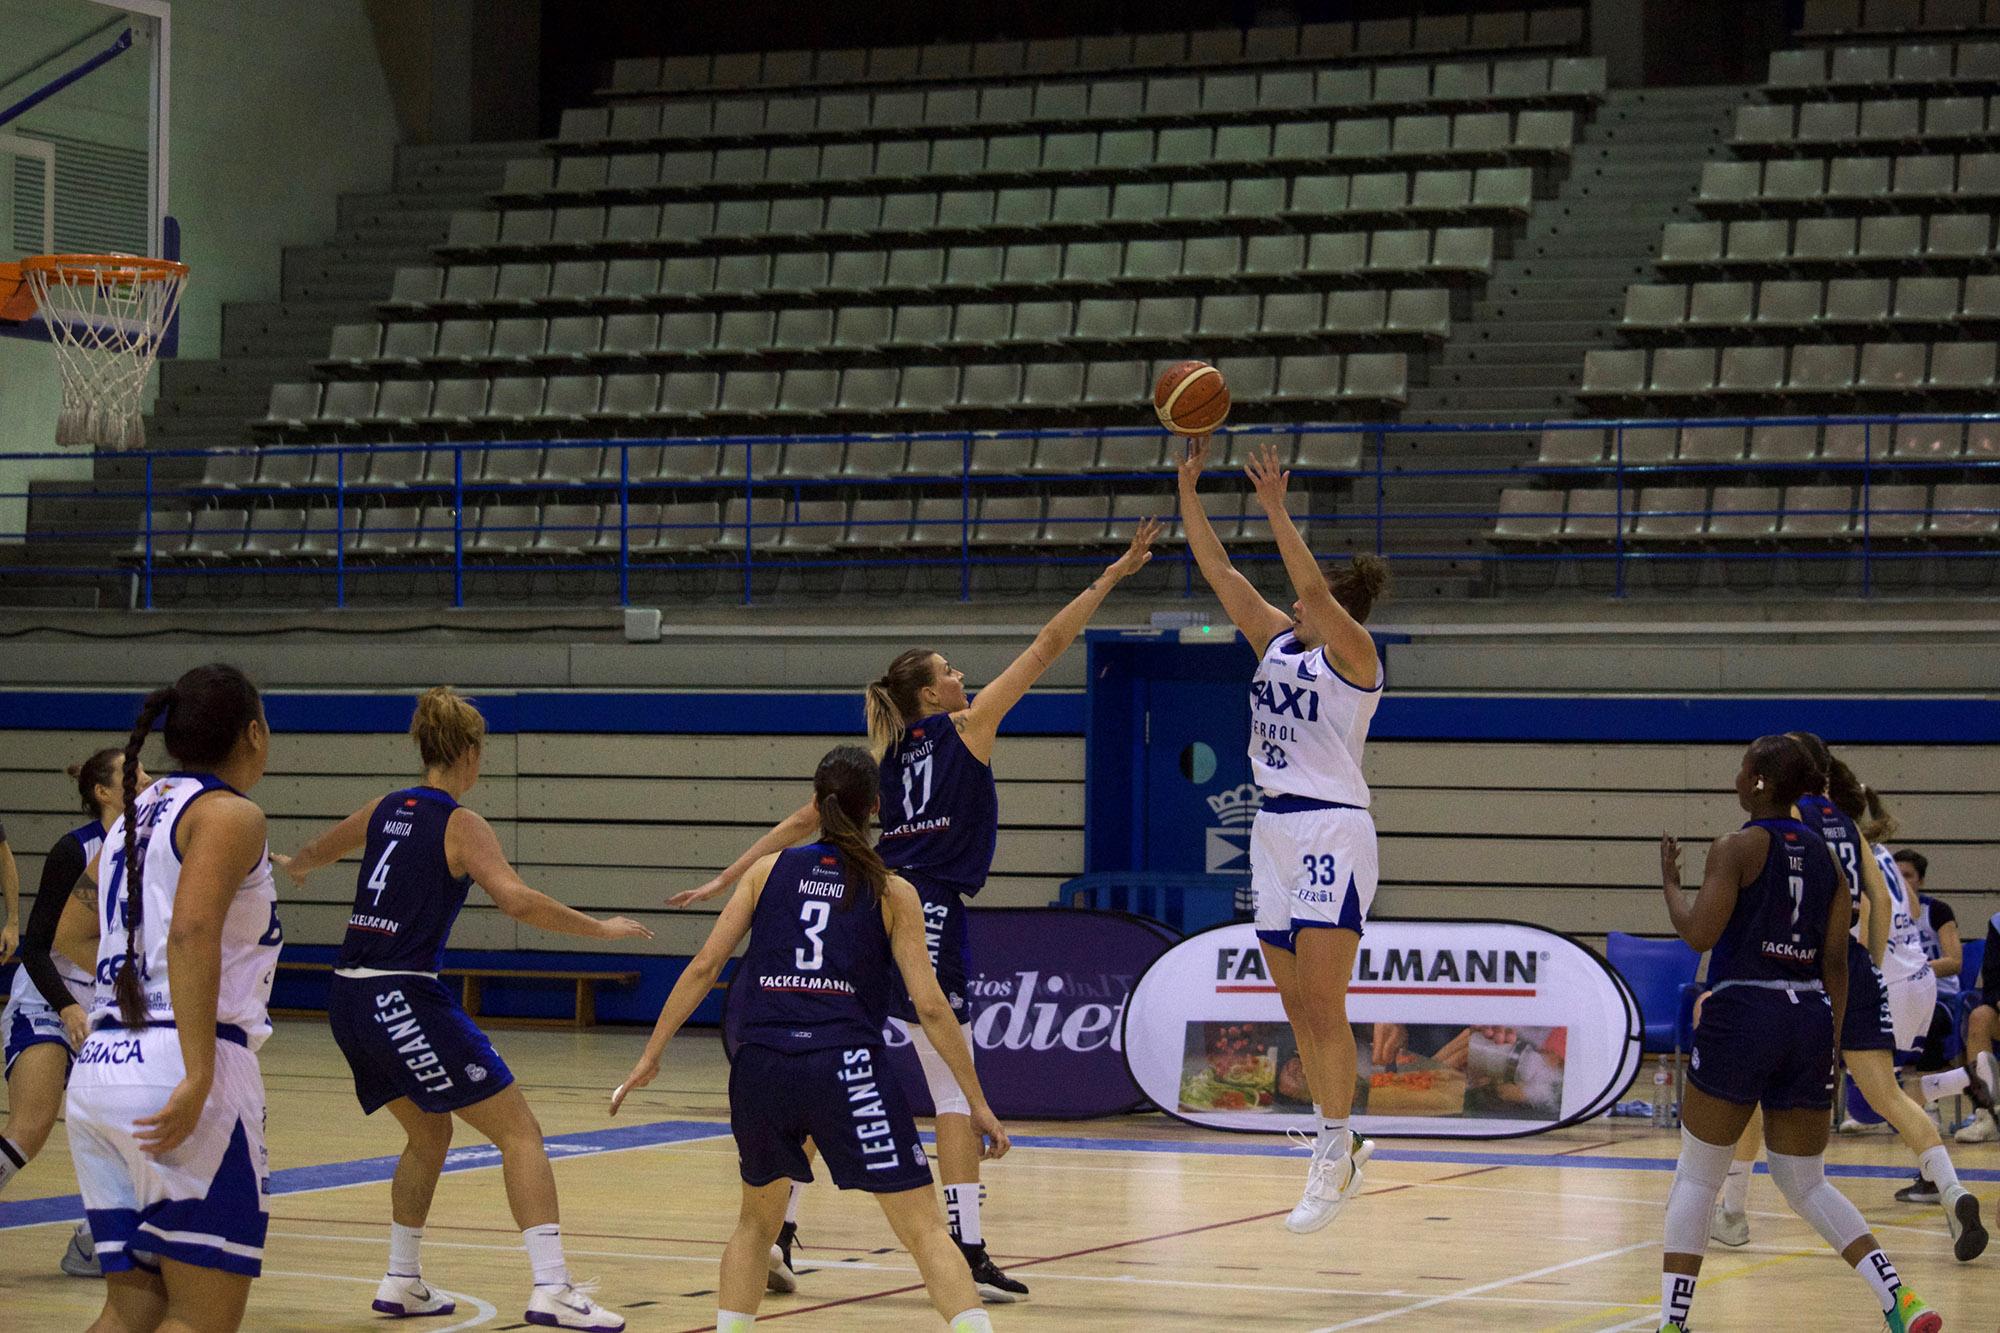 Primeira derrota do 2020 do Baxi Ferrol / BAXI FERROL